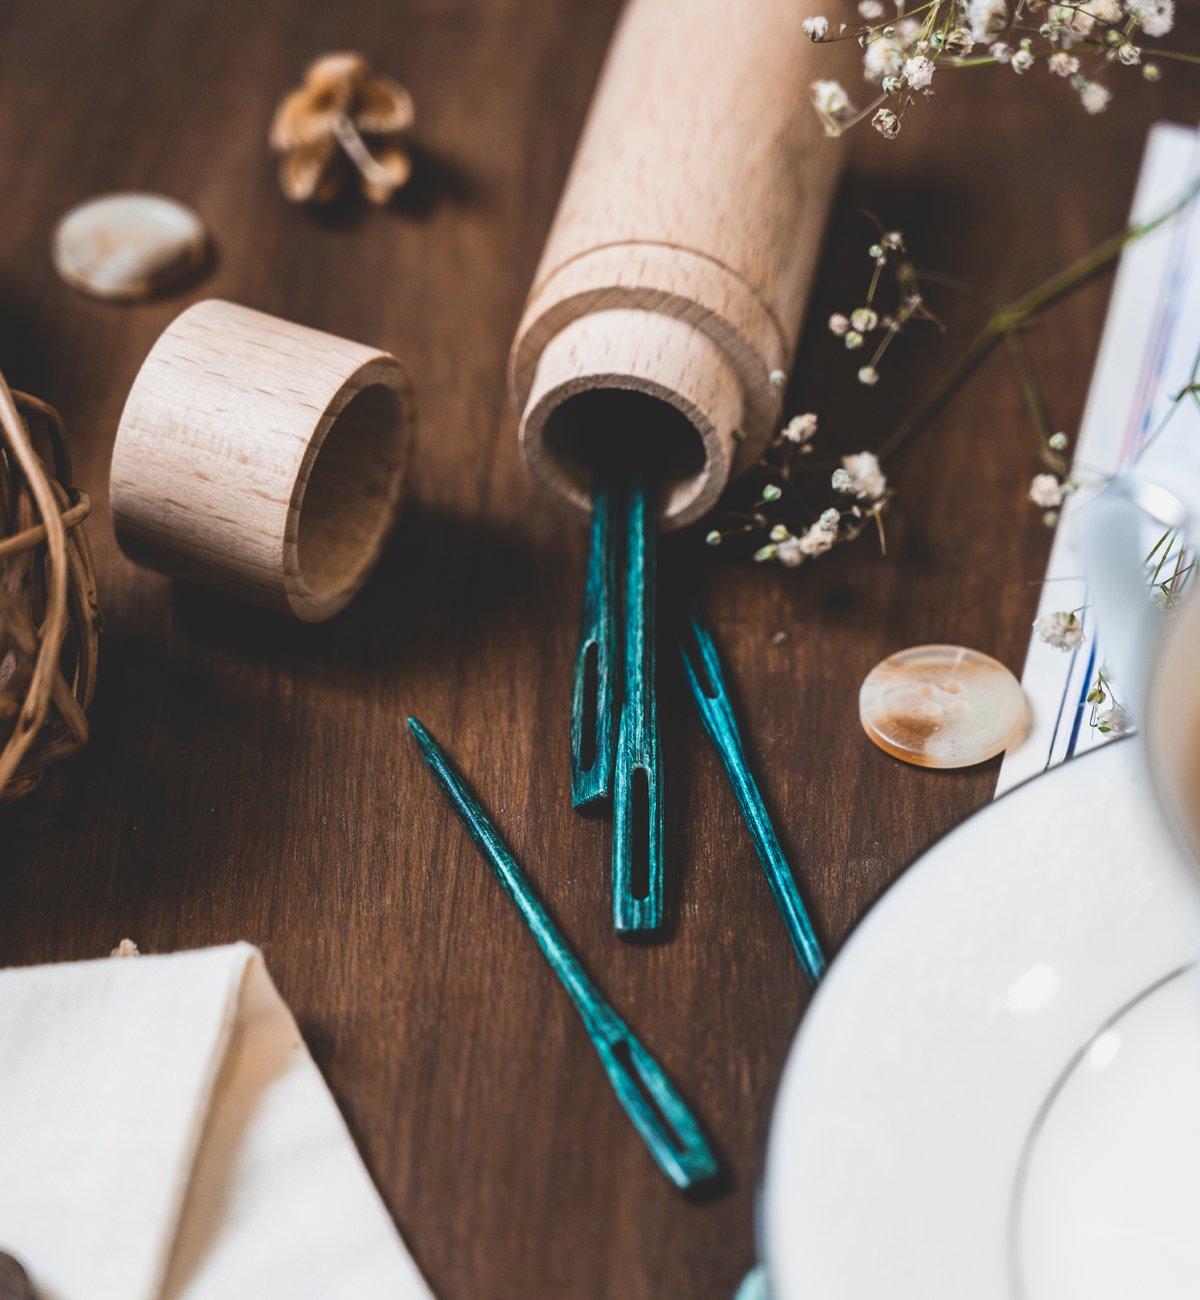 Teal Wooden Darning Needles